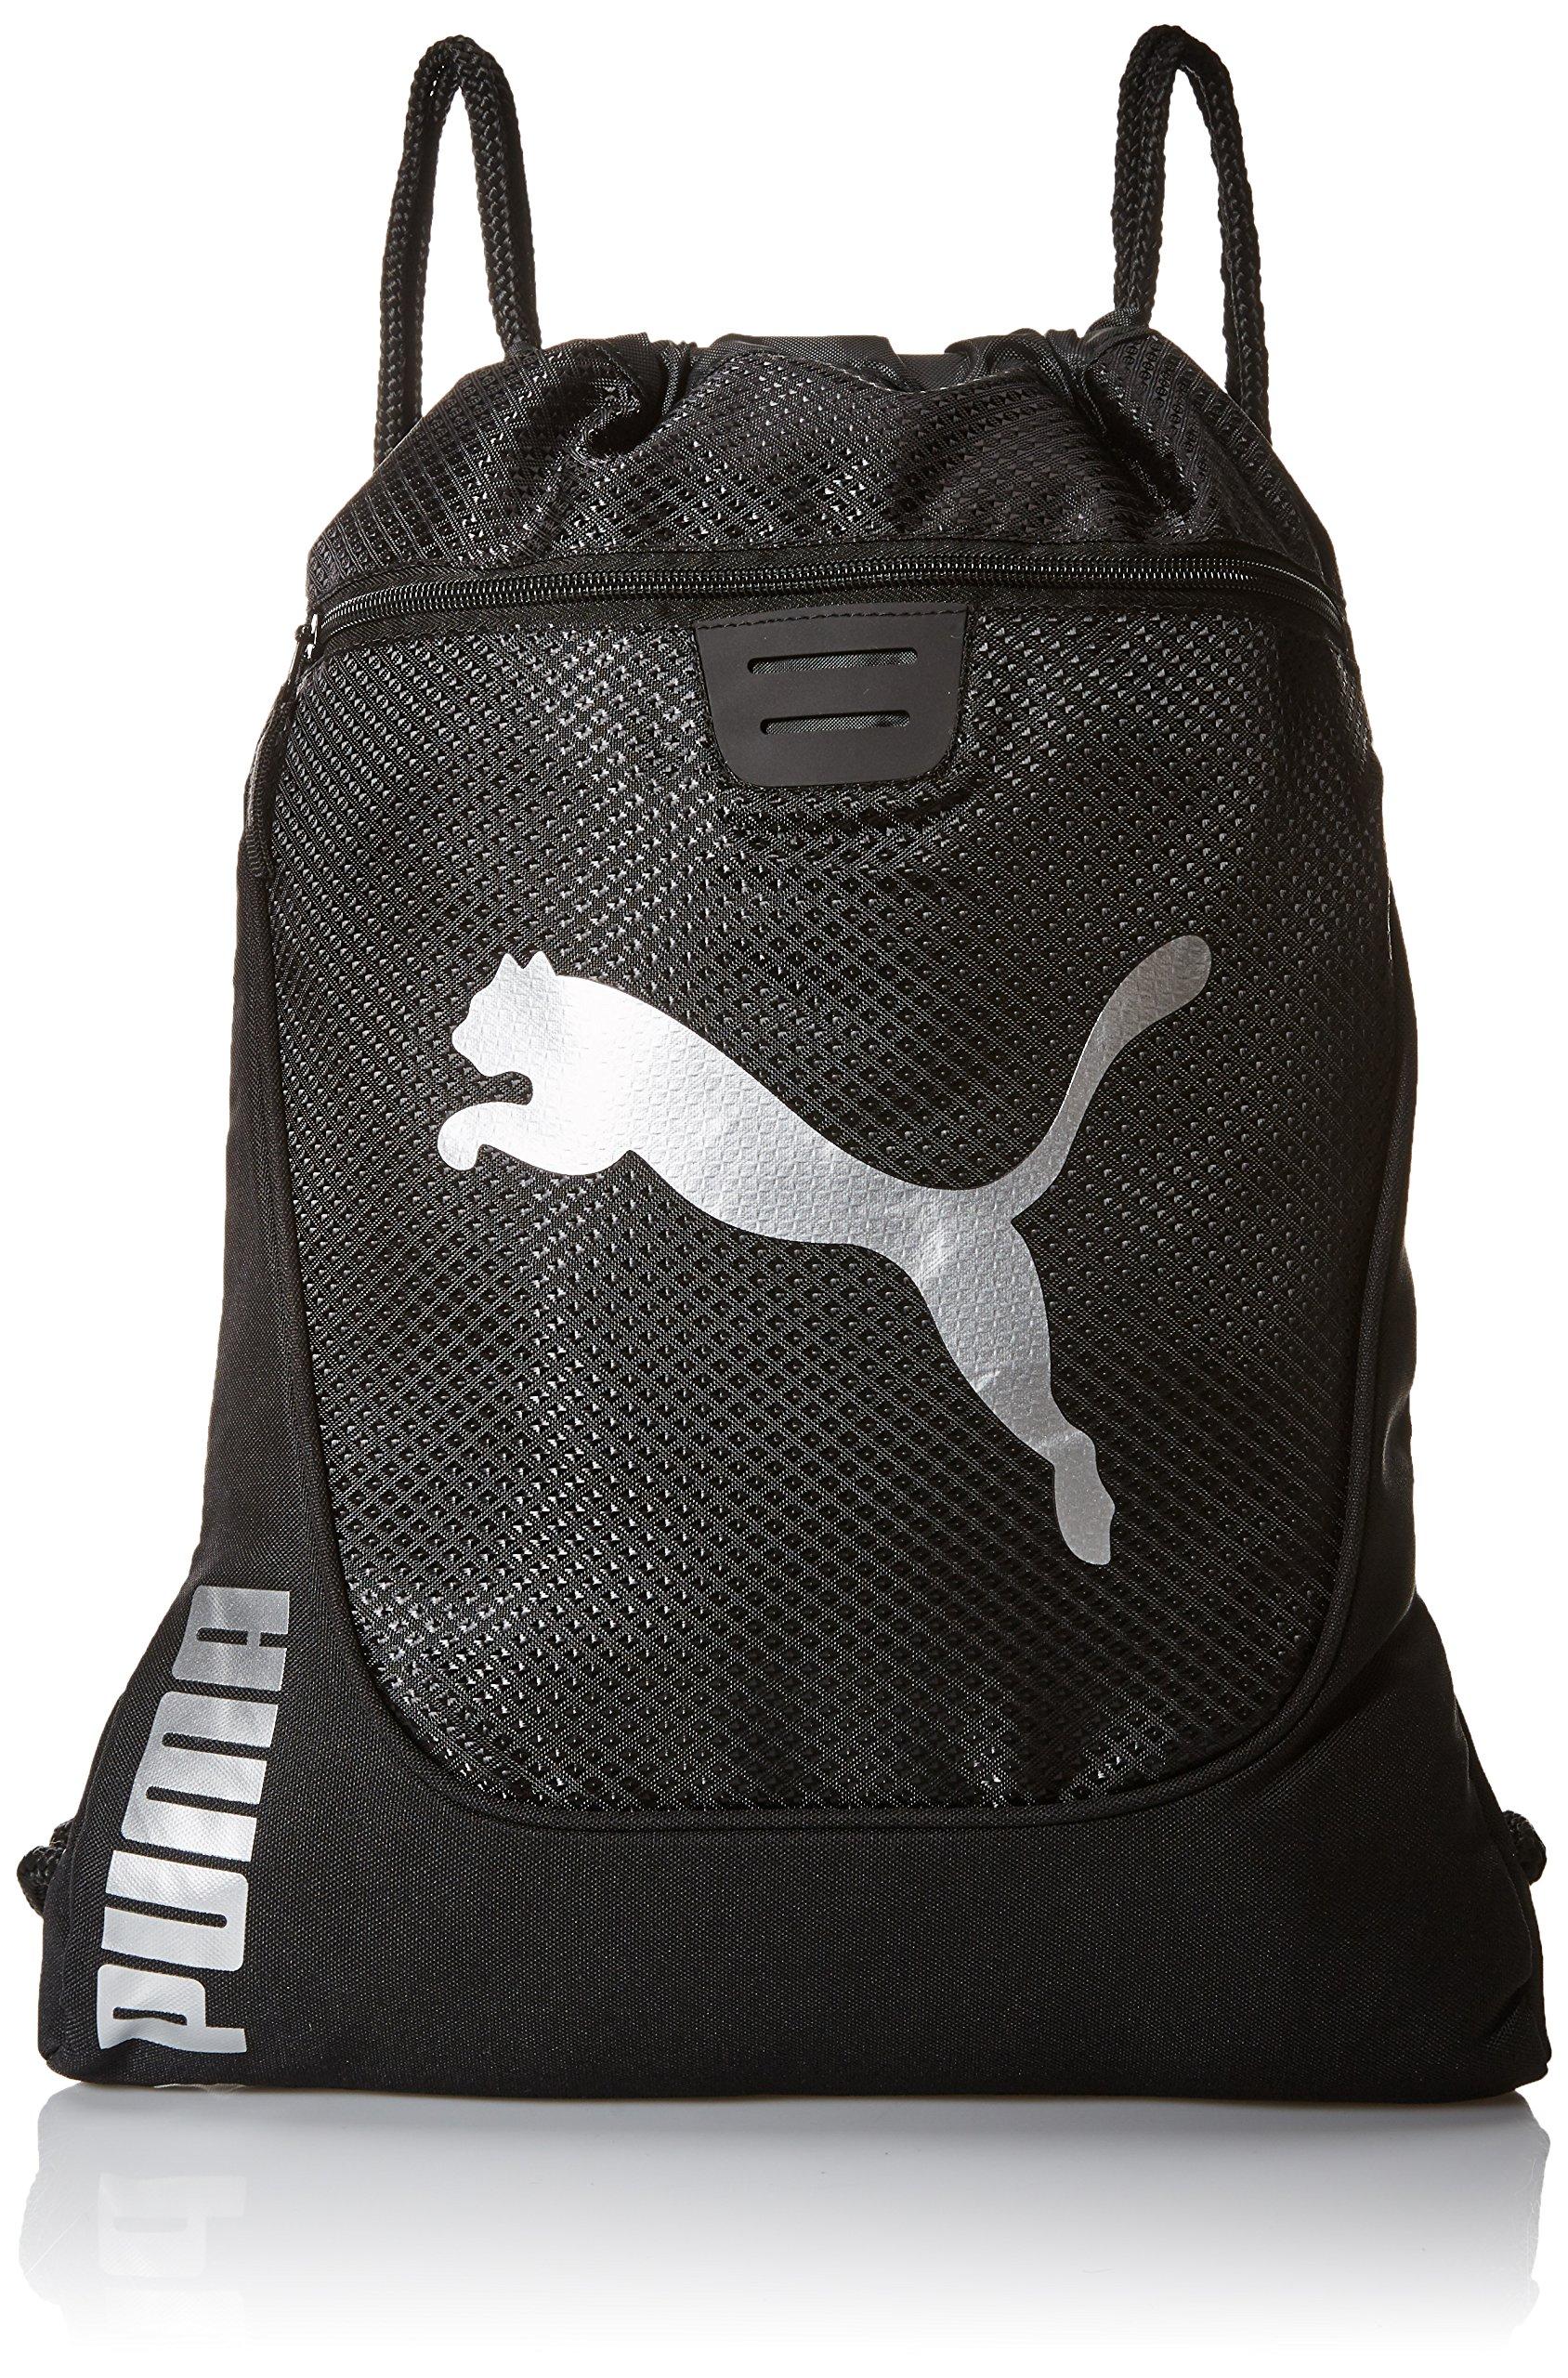 Puma Evercat Contender 2.0 Carrysack Accessory